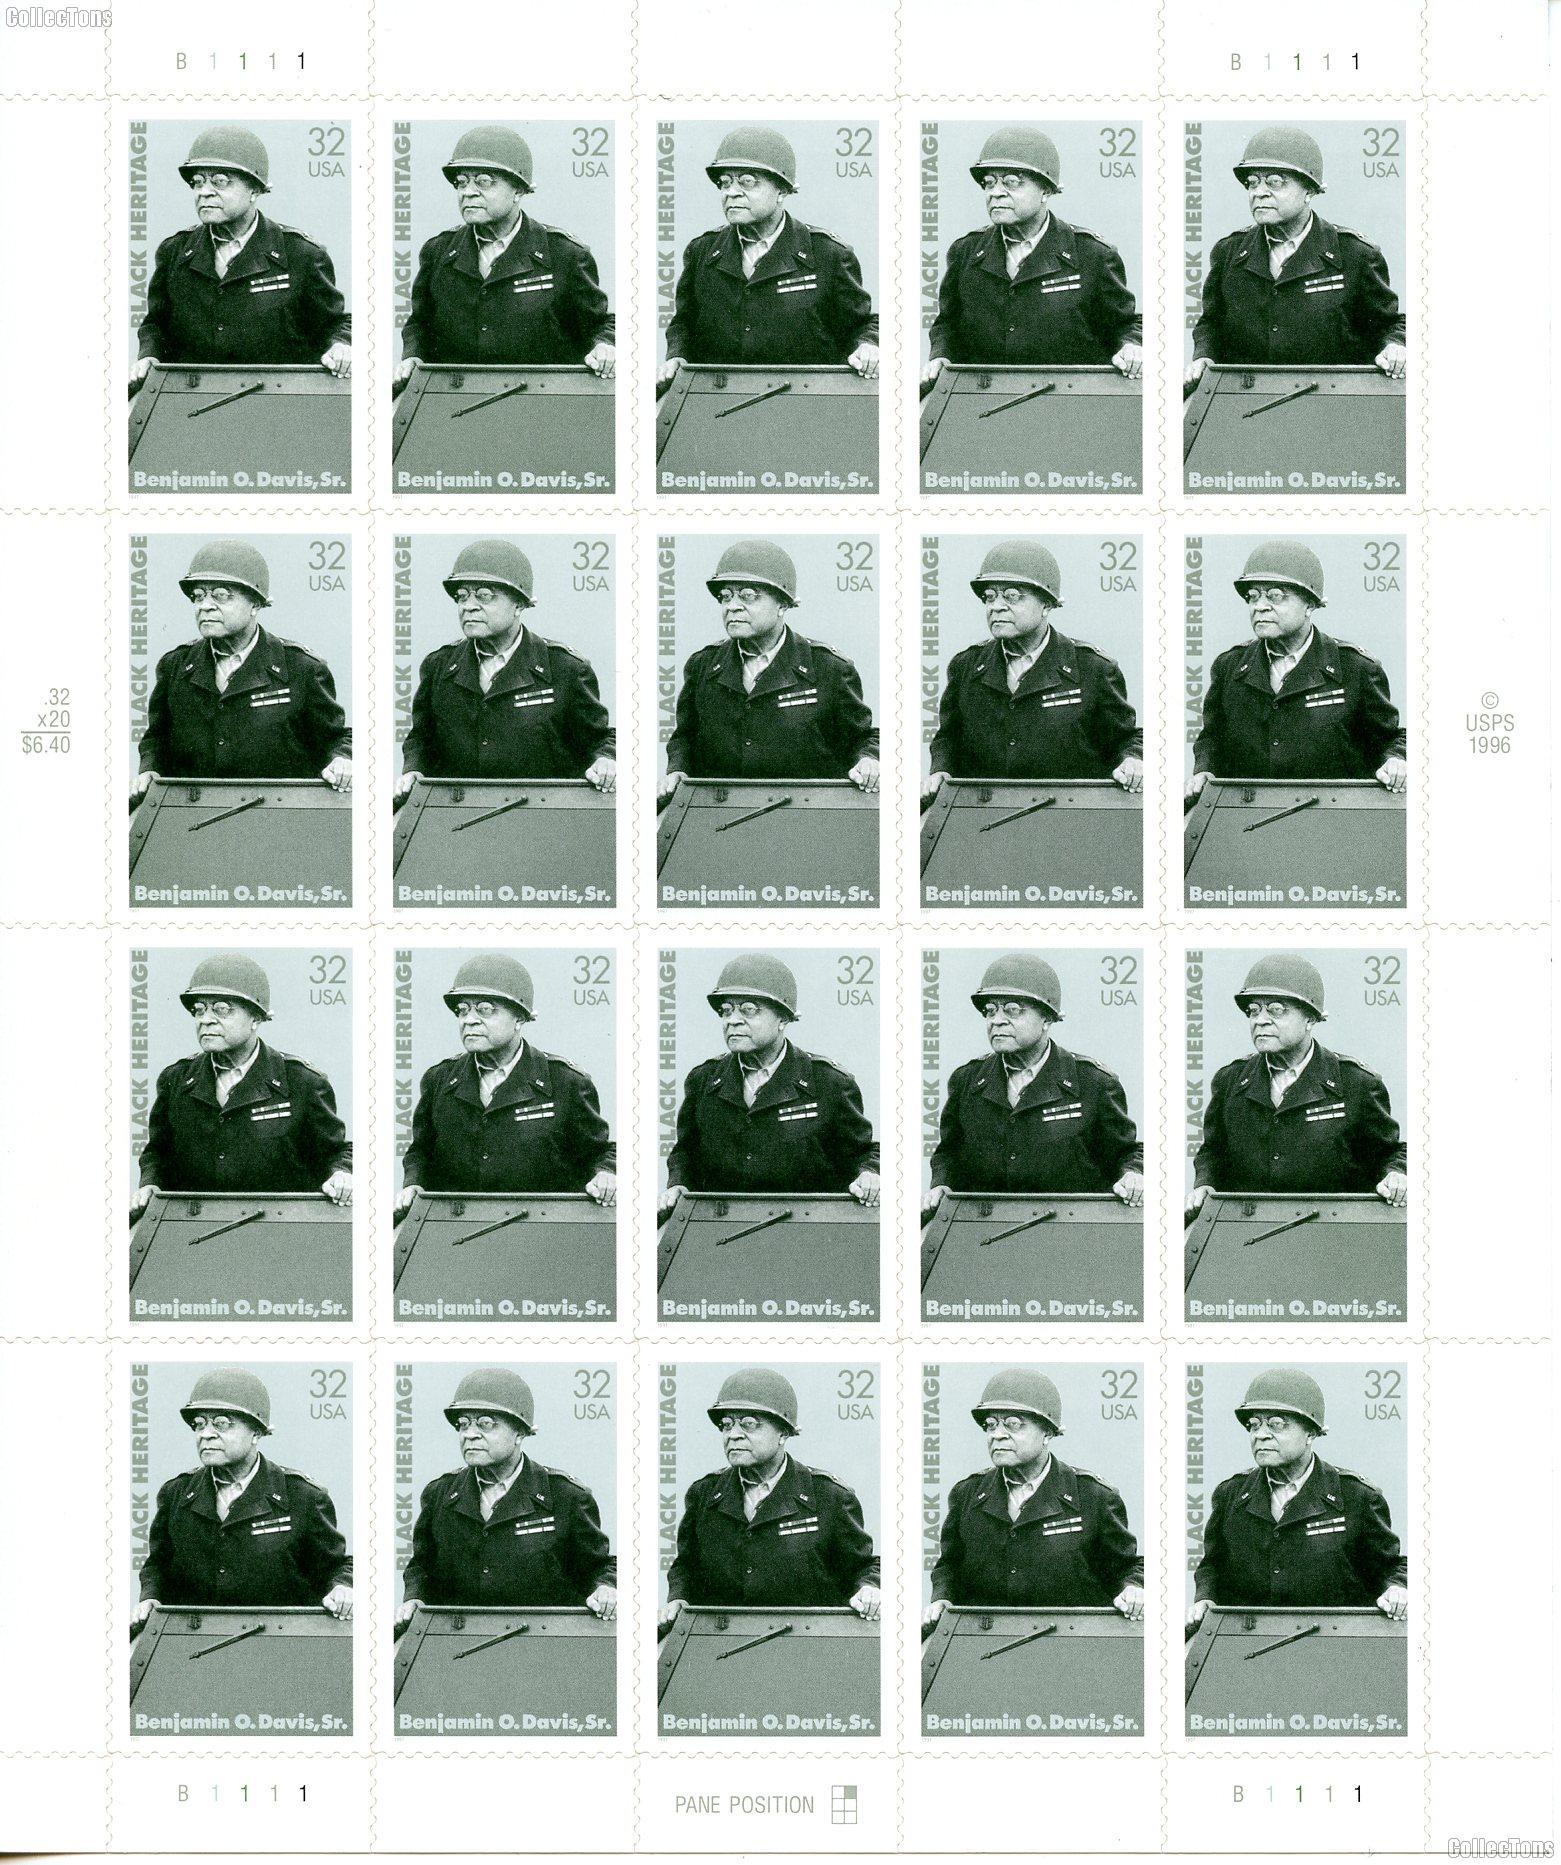 1997 Benjamin O. Davis Sr. 32 Cent US Postage Stamp Unused Sheet of 20 Scott #3121